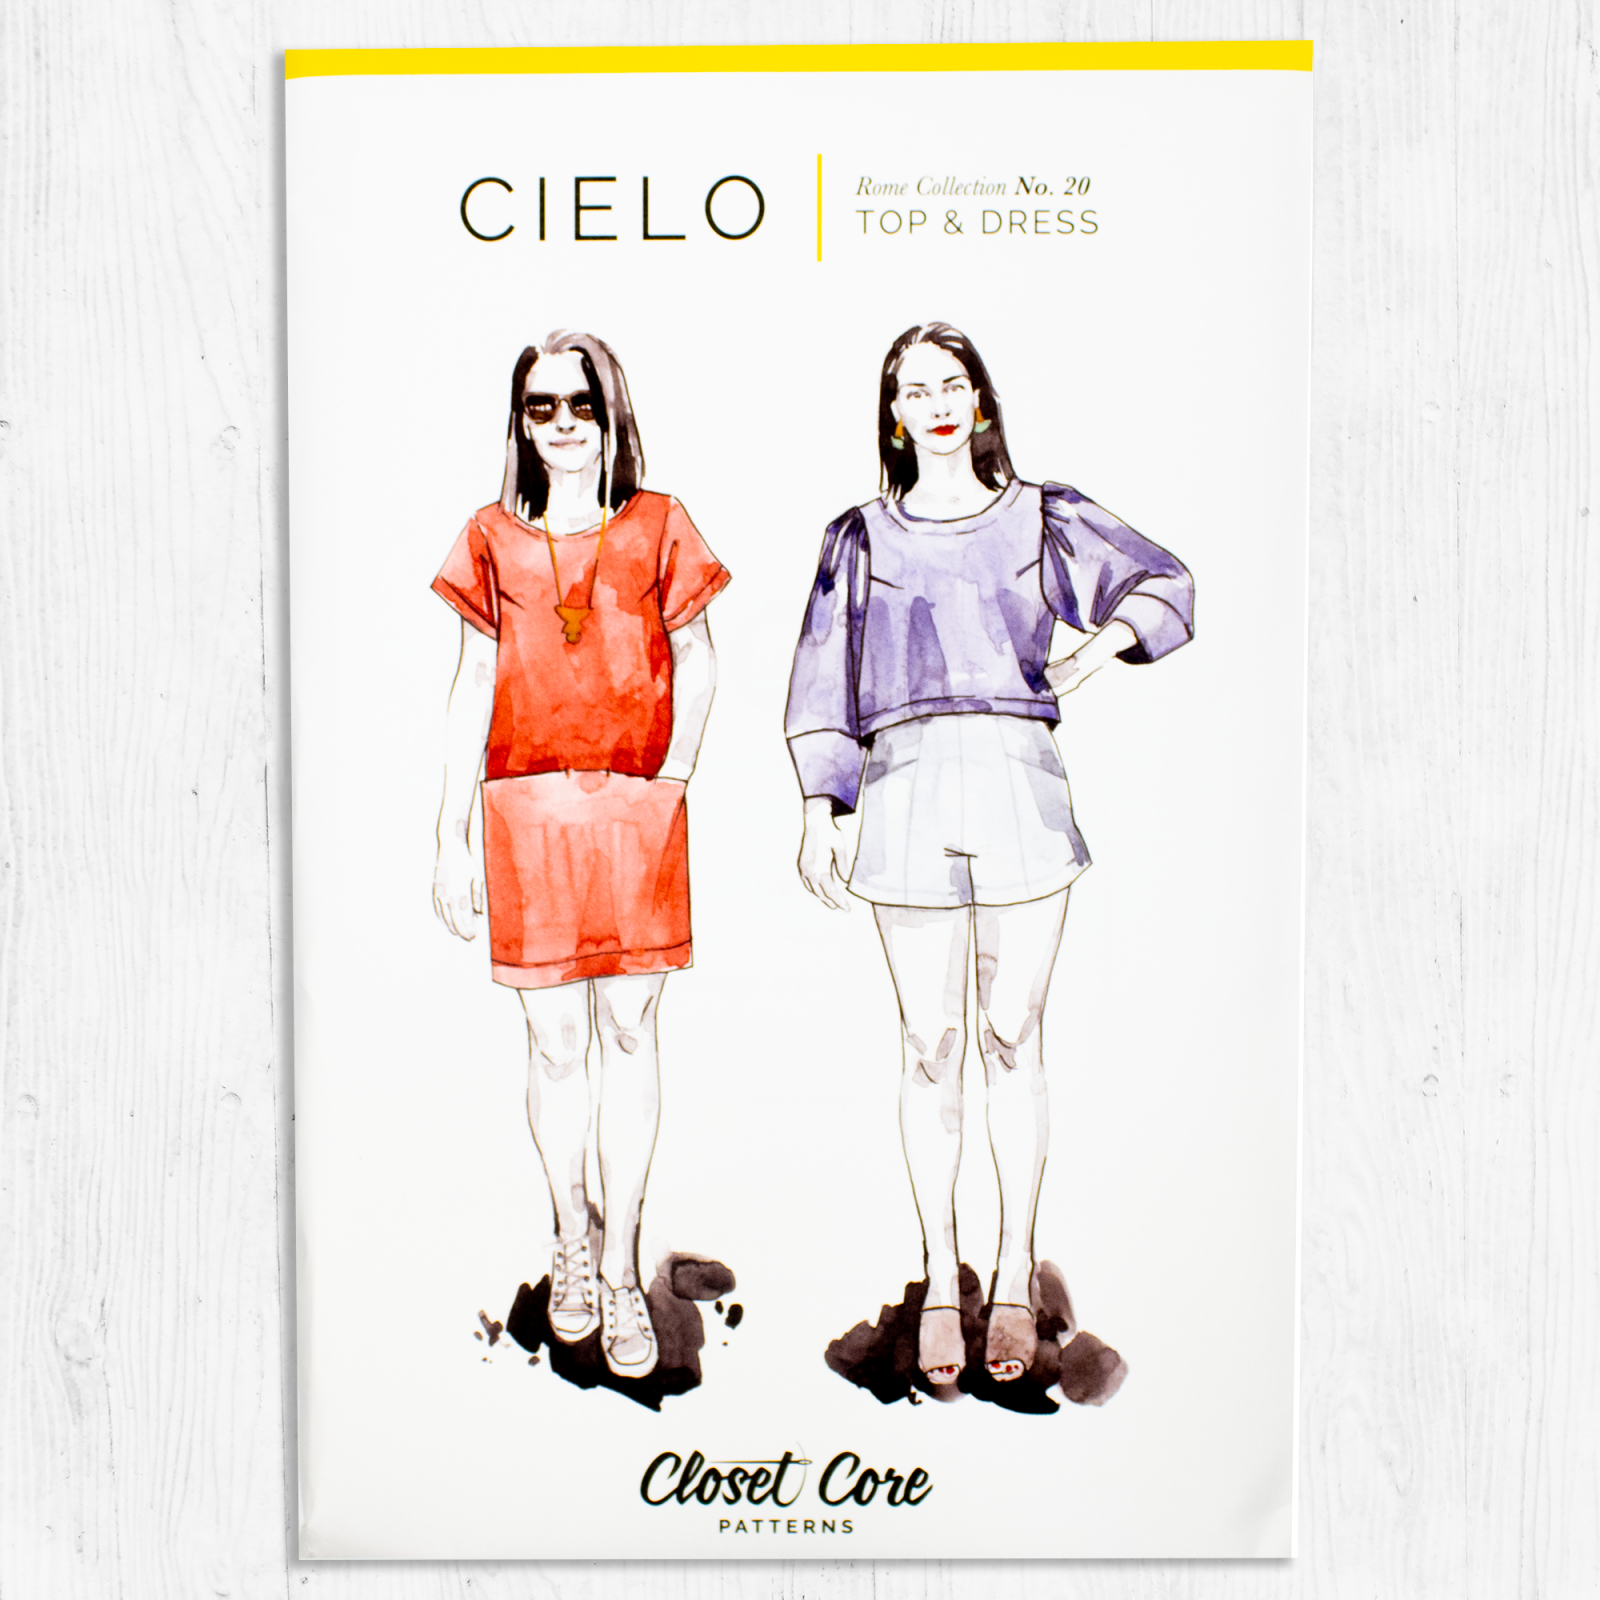 Closet Core Patterns - Cielo Top & Dress